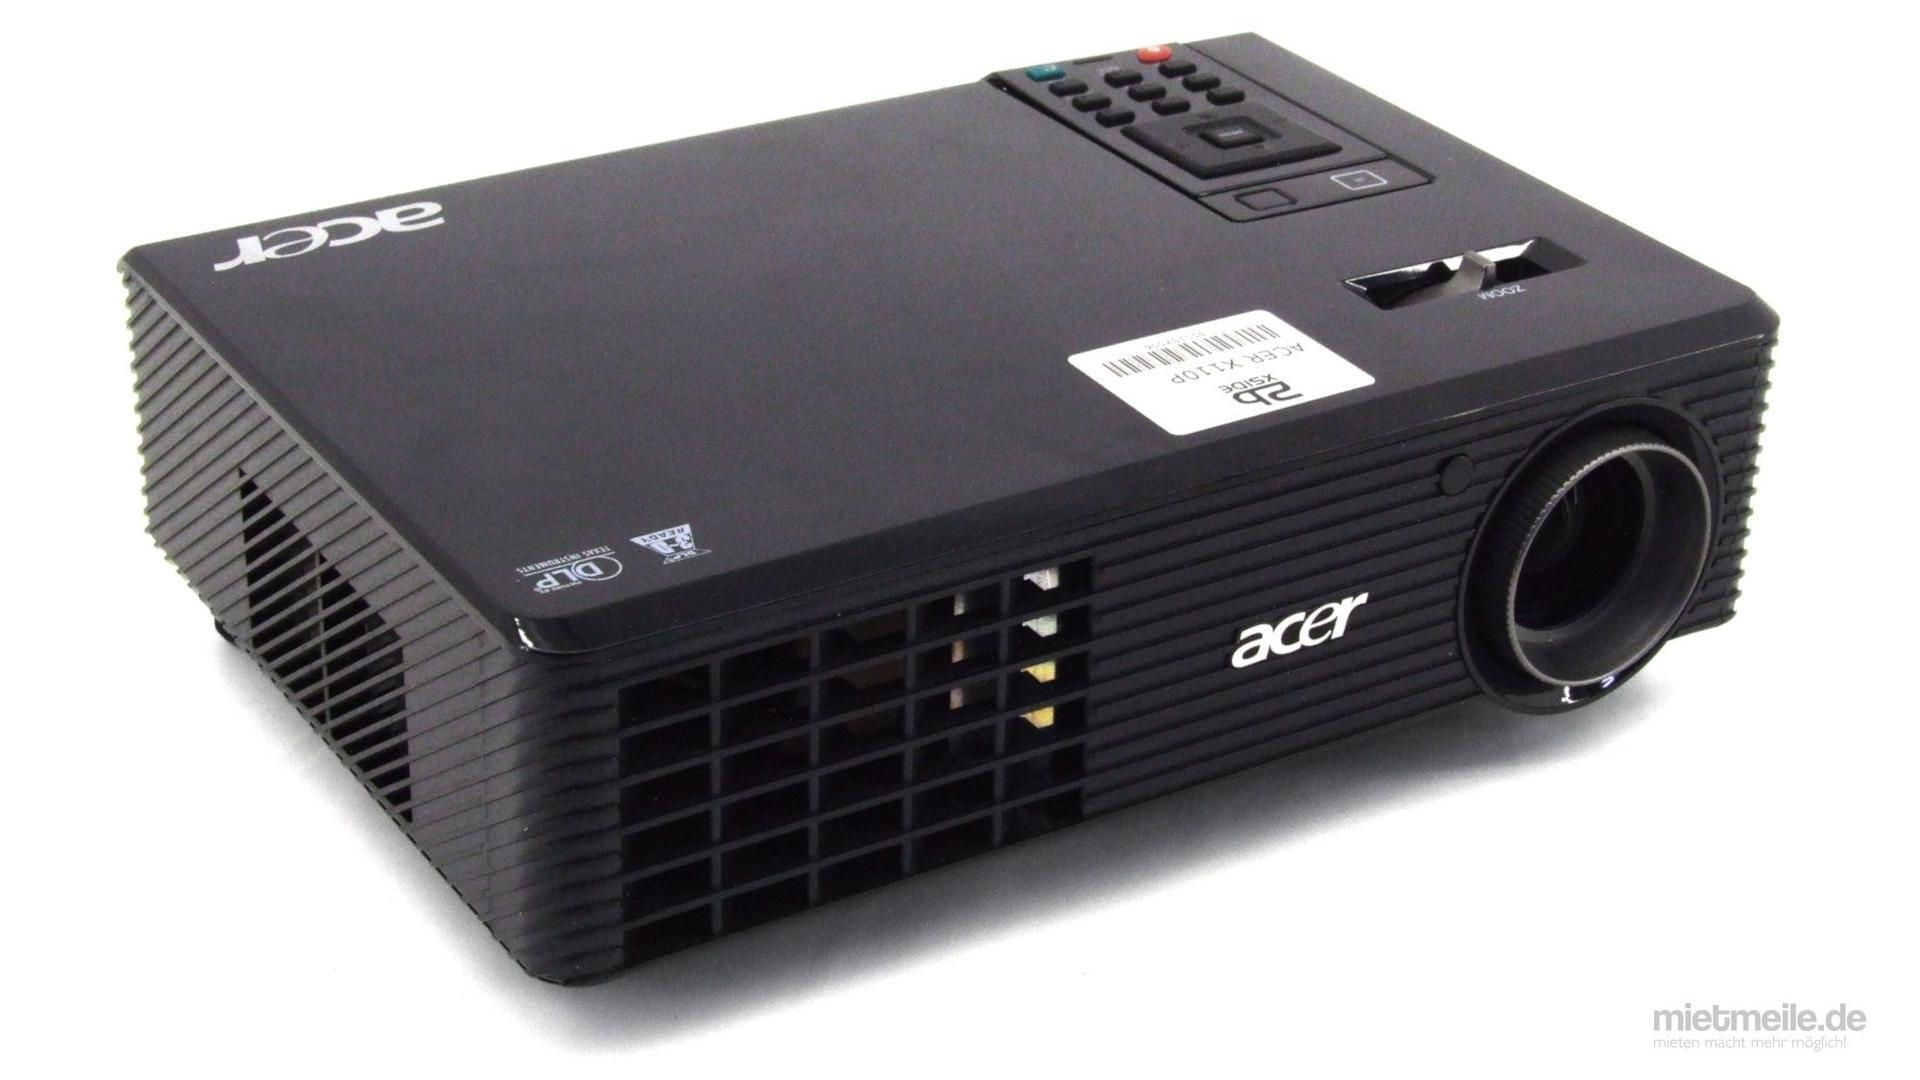 Beamer mieten & vermieten - Beamer Acer X110P DLP-Projektor 3D in Schkeuditz